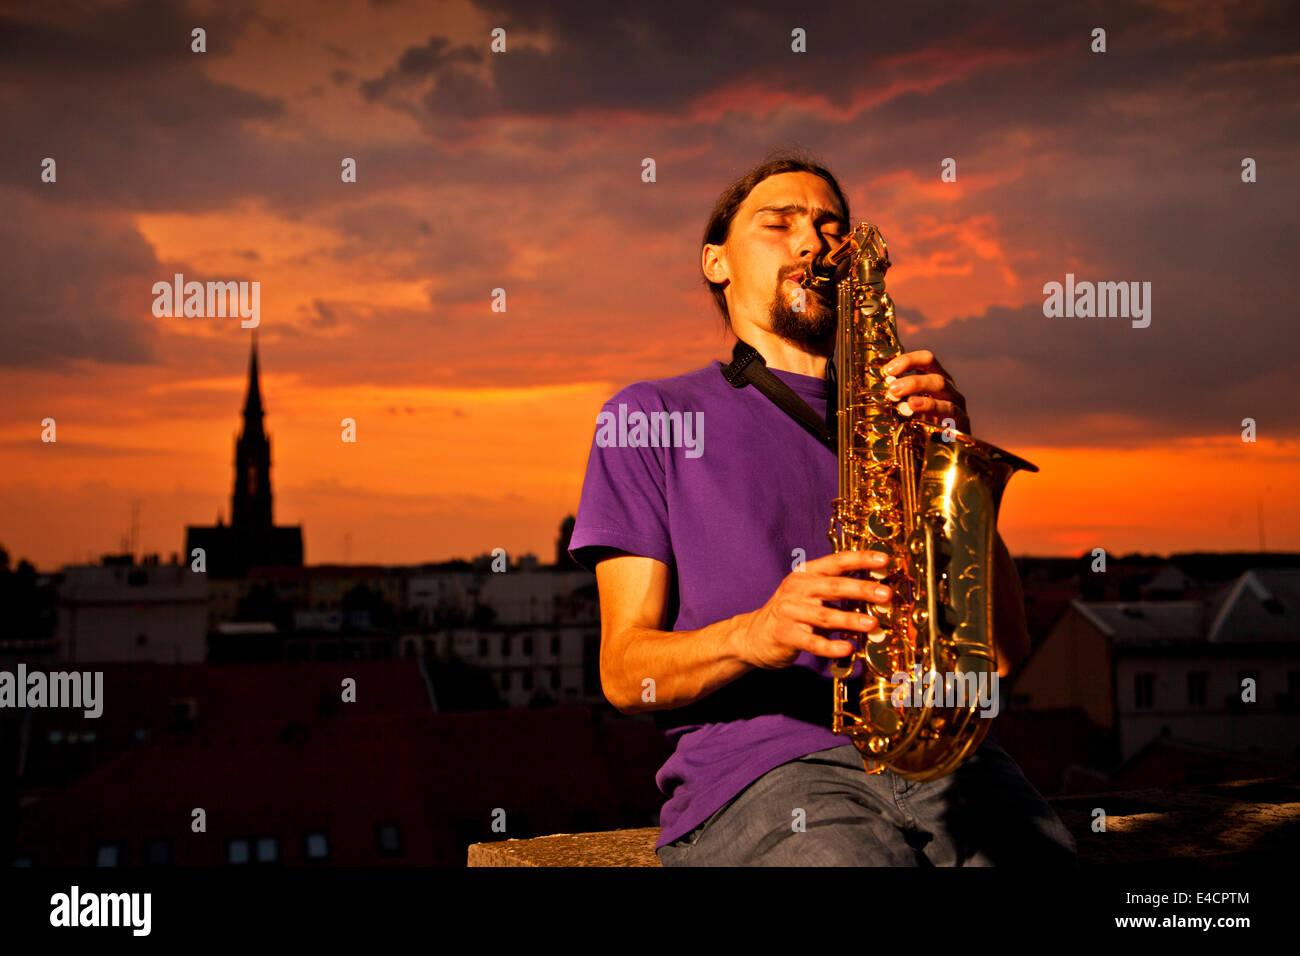 Hombre tocando el saxofón en el sunset, en Osijek, Croacia Imagen De Stock